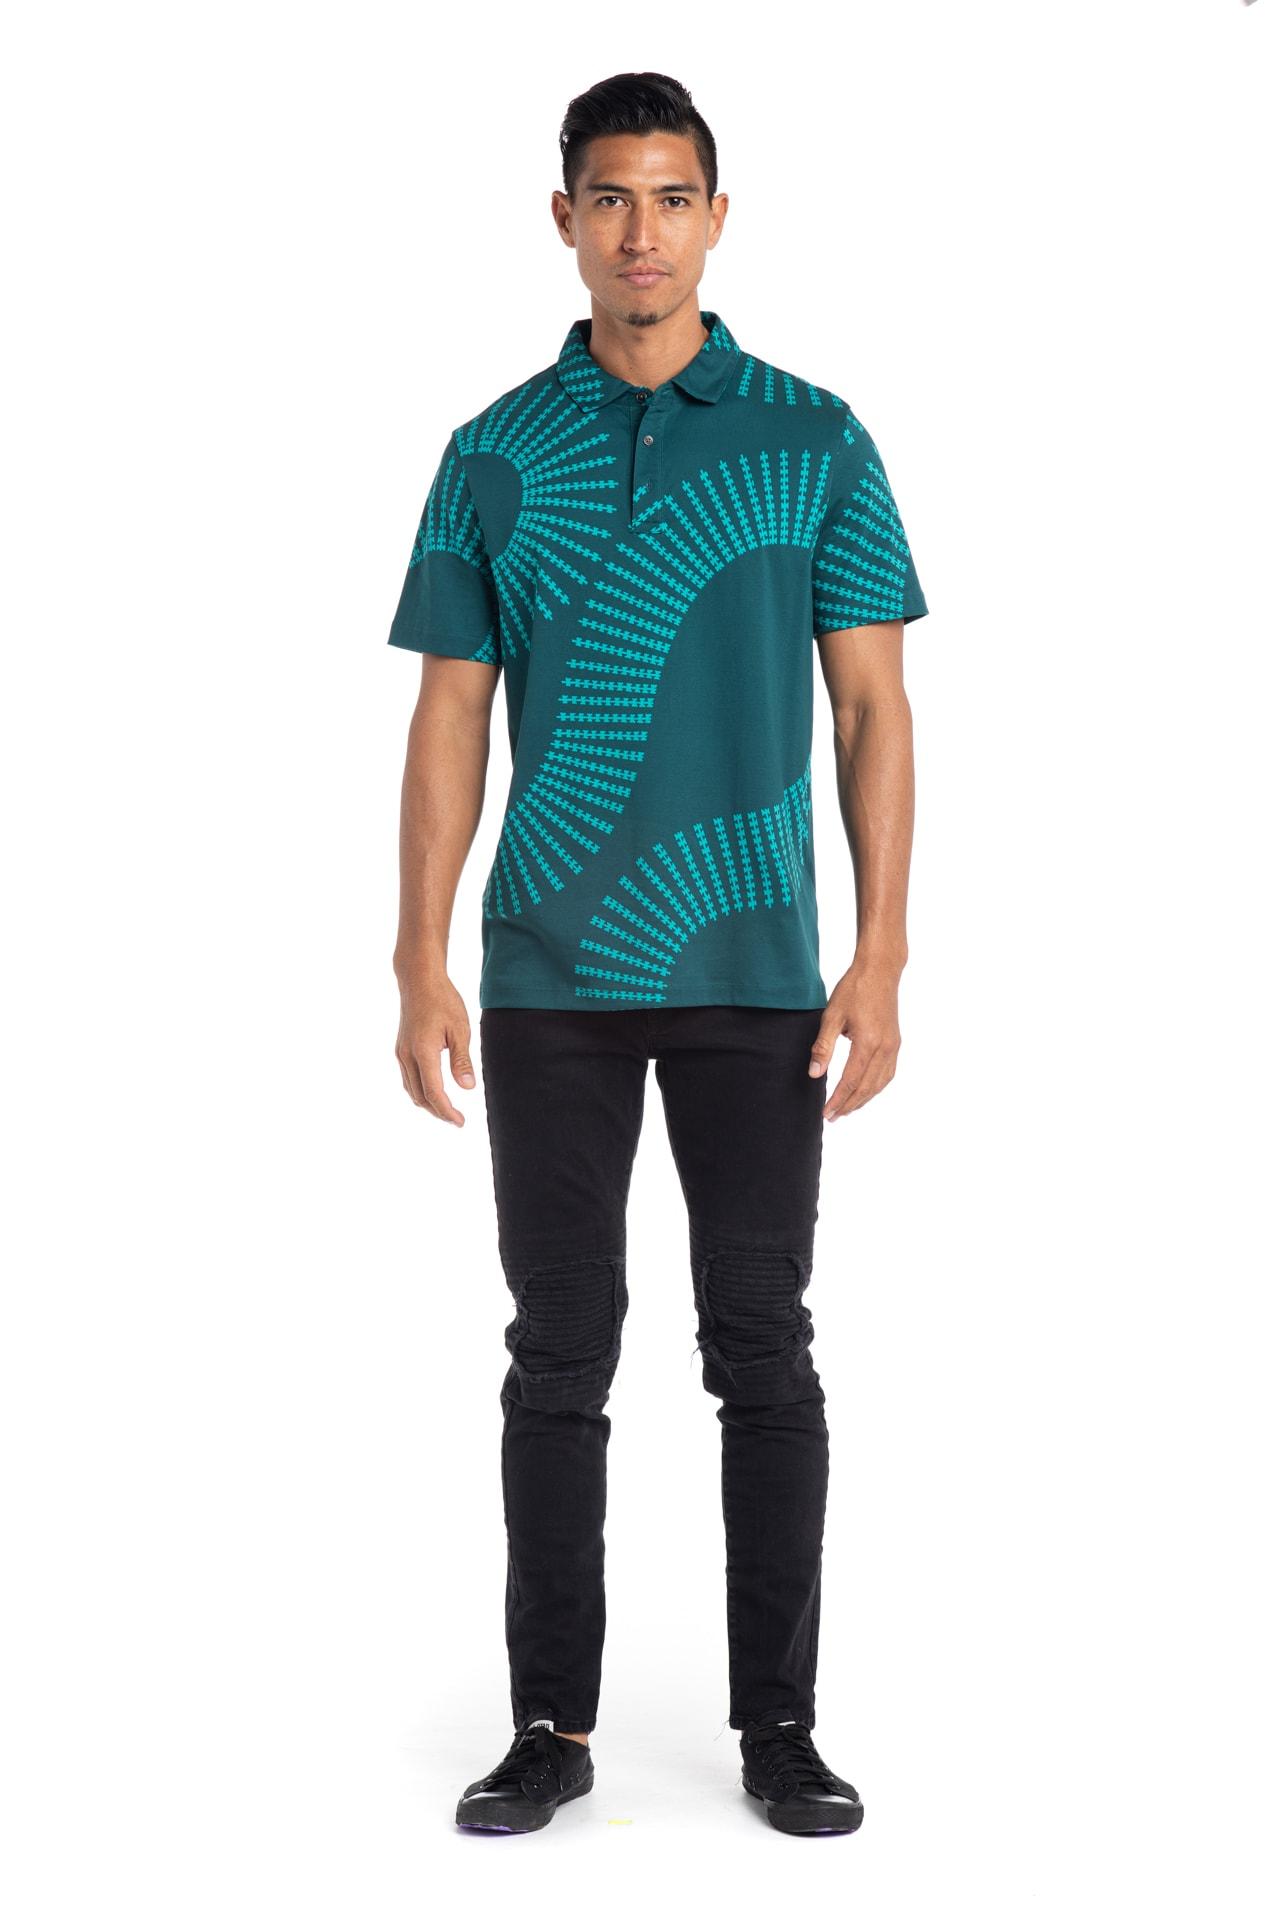 Male model wearing Waikii Polo in Blue Grass/Atlantic - Front View